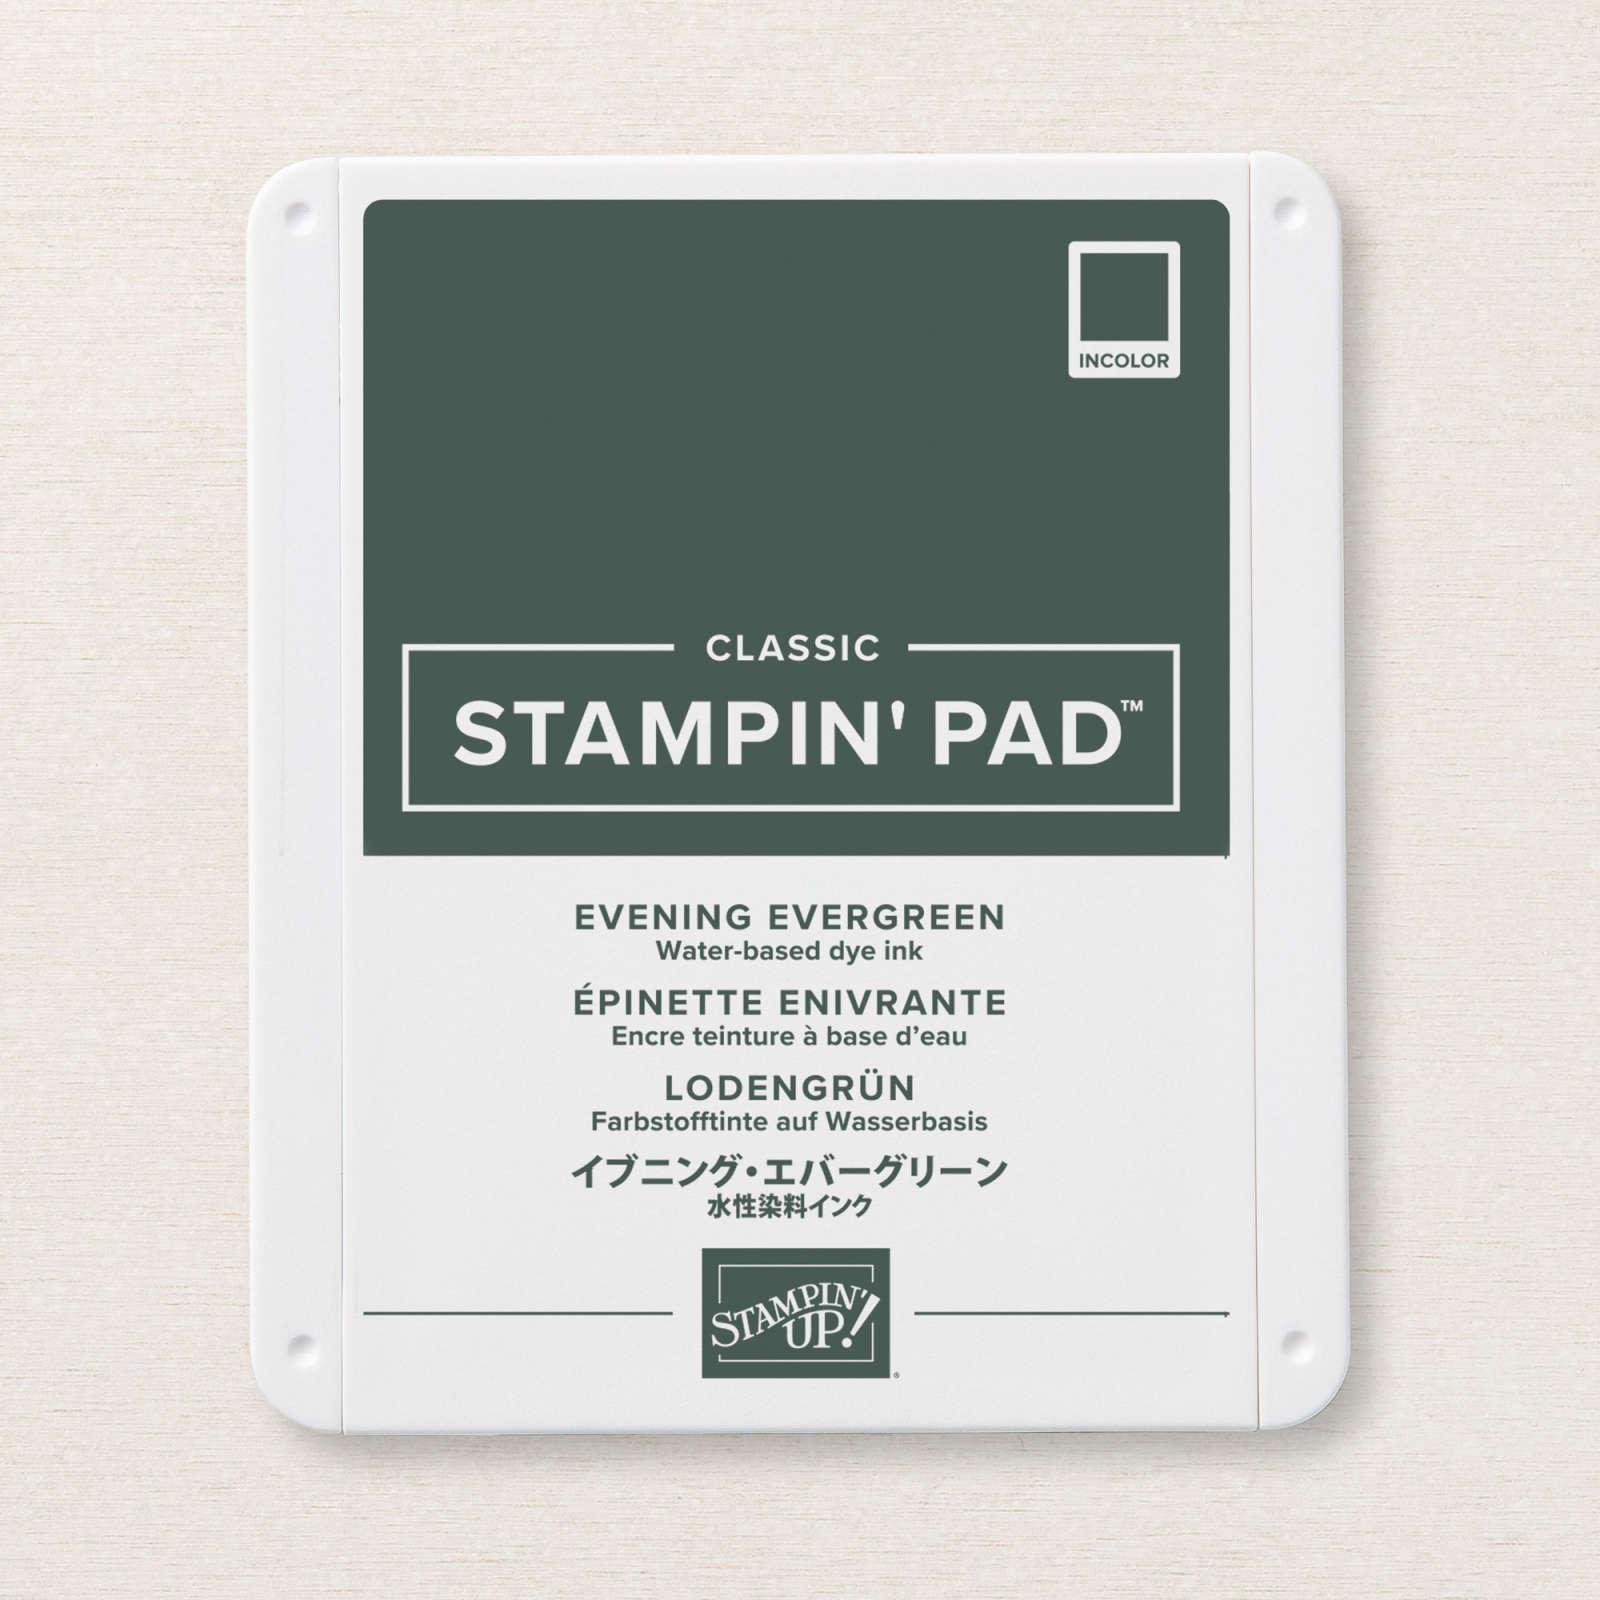 Evening Evergreen Classic Stampin' Pad